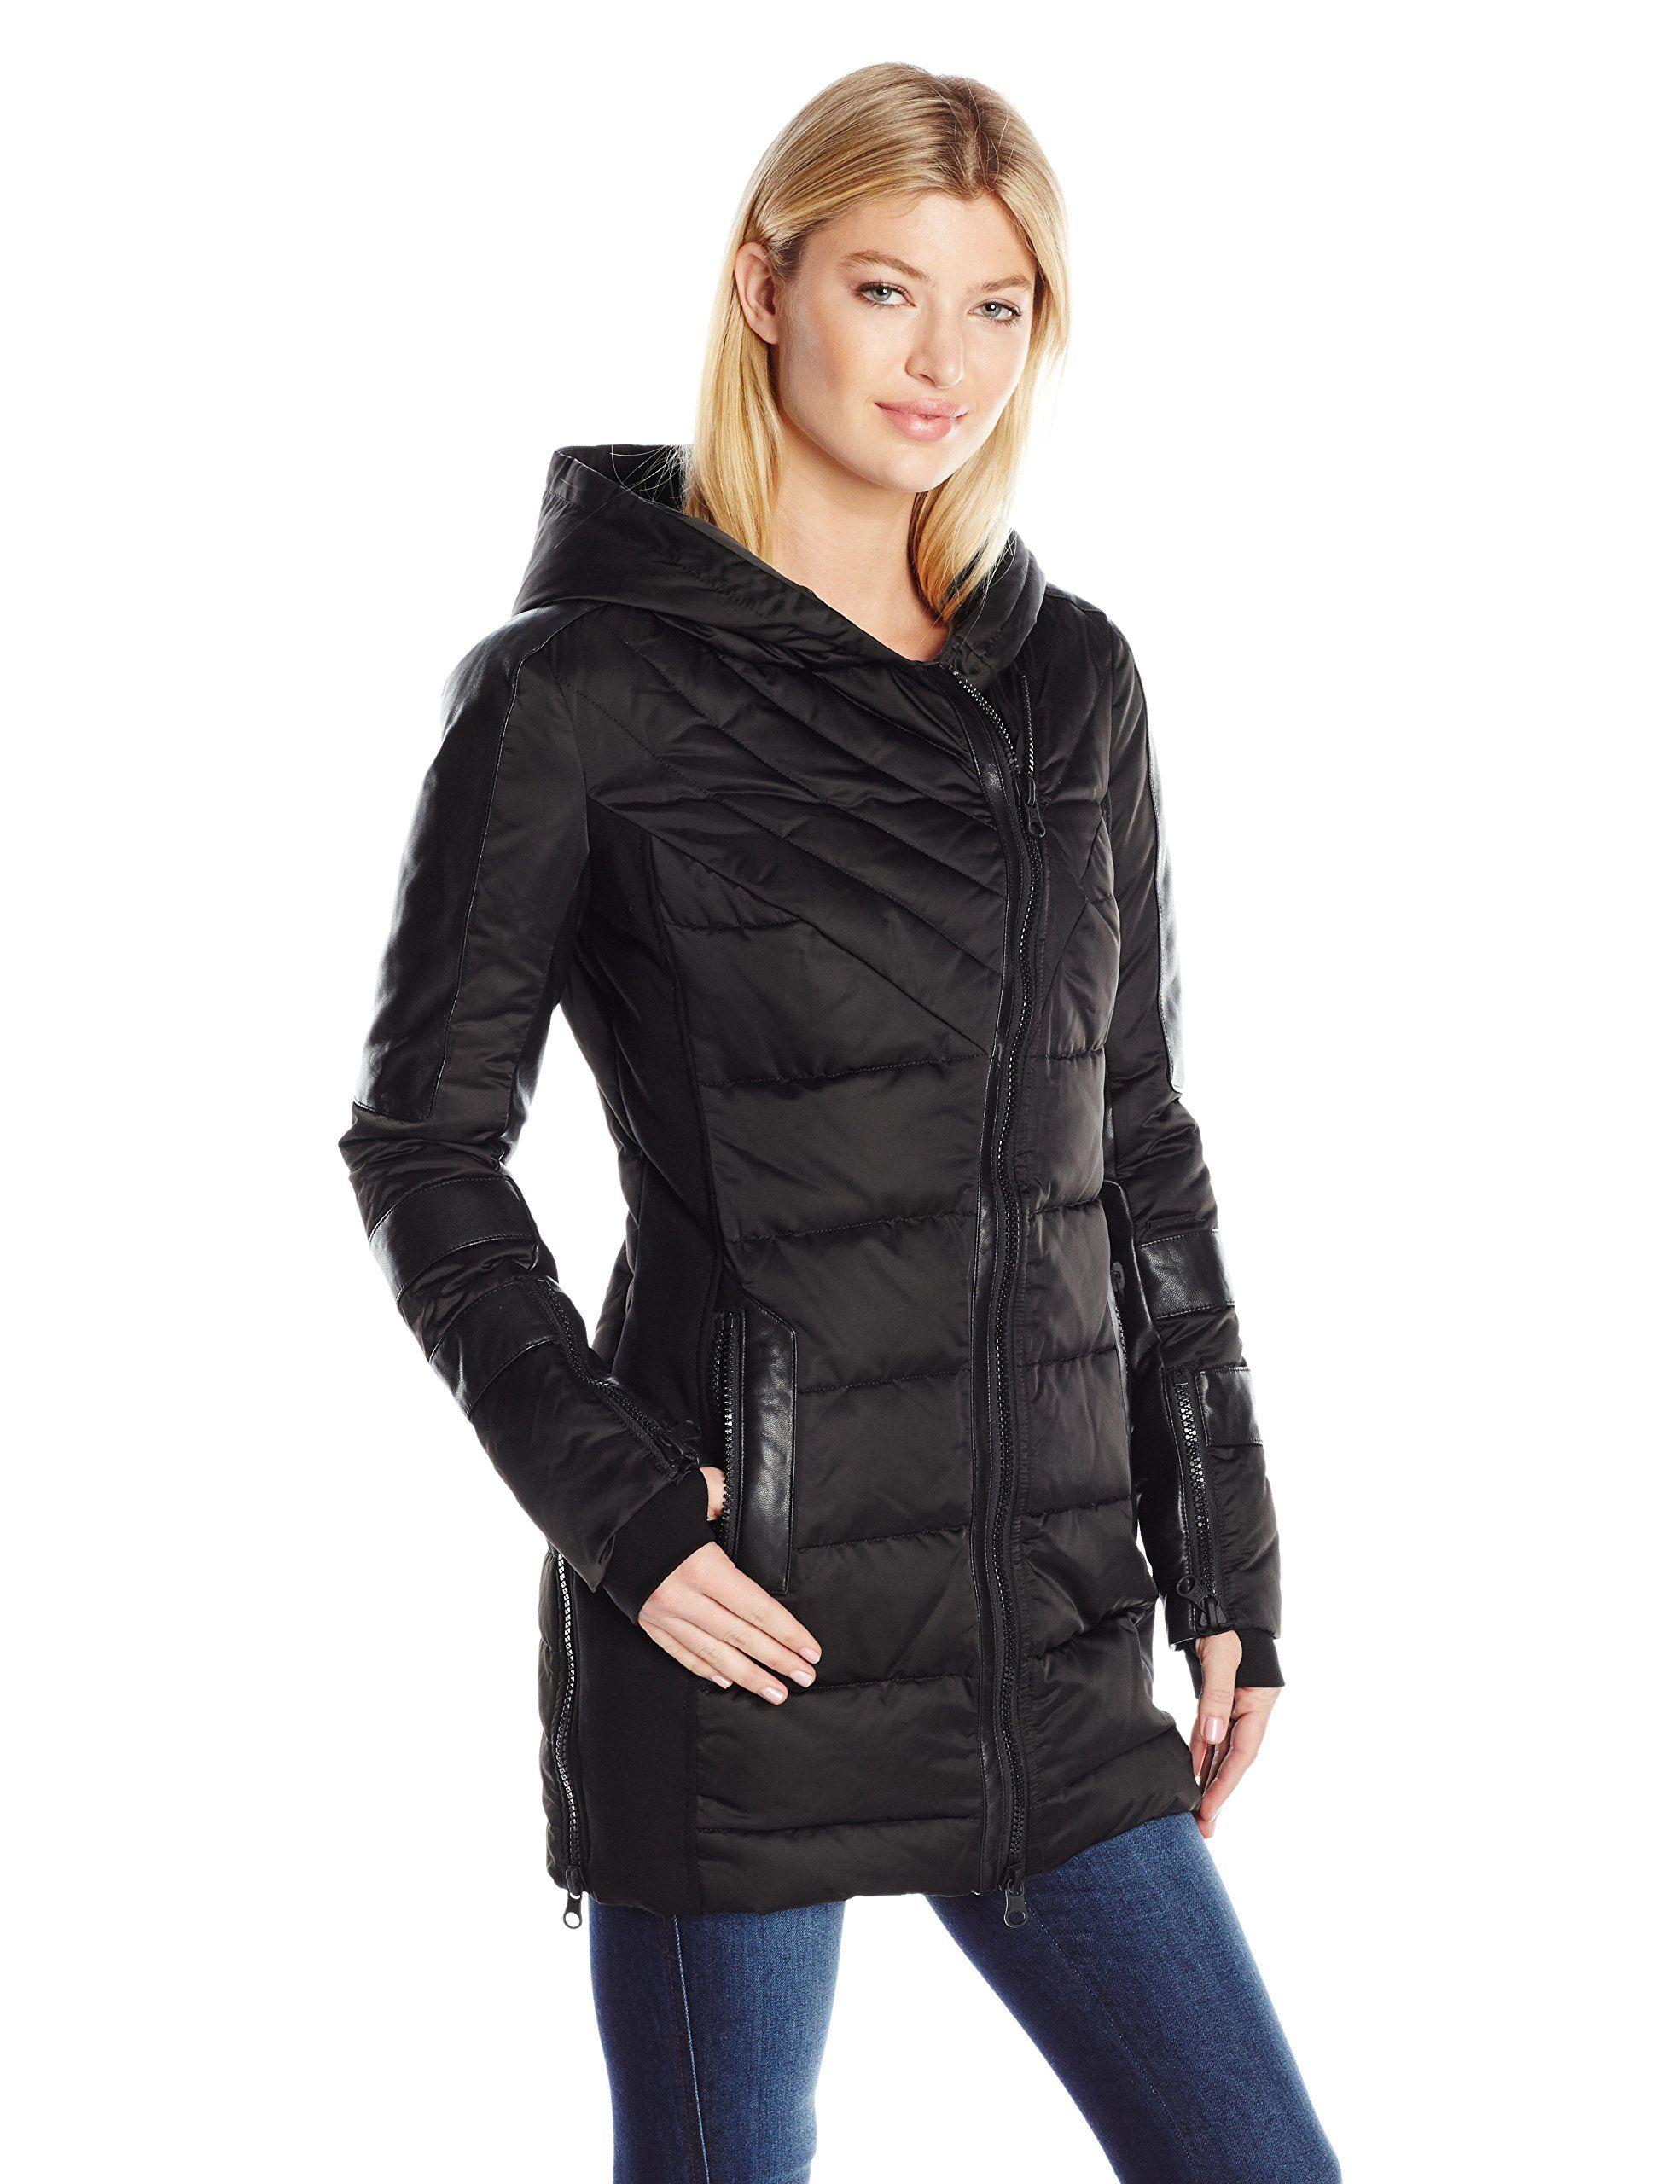 Blanc Noir Women's Asymmetric Puffer Coat, Black Satin